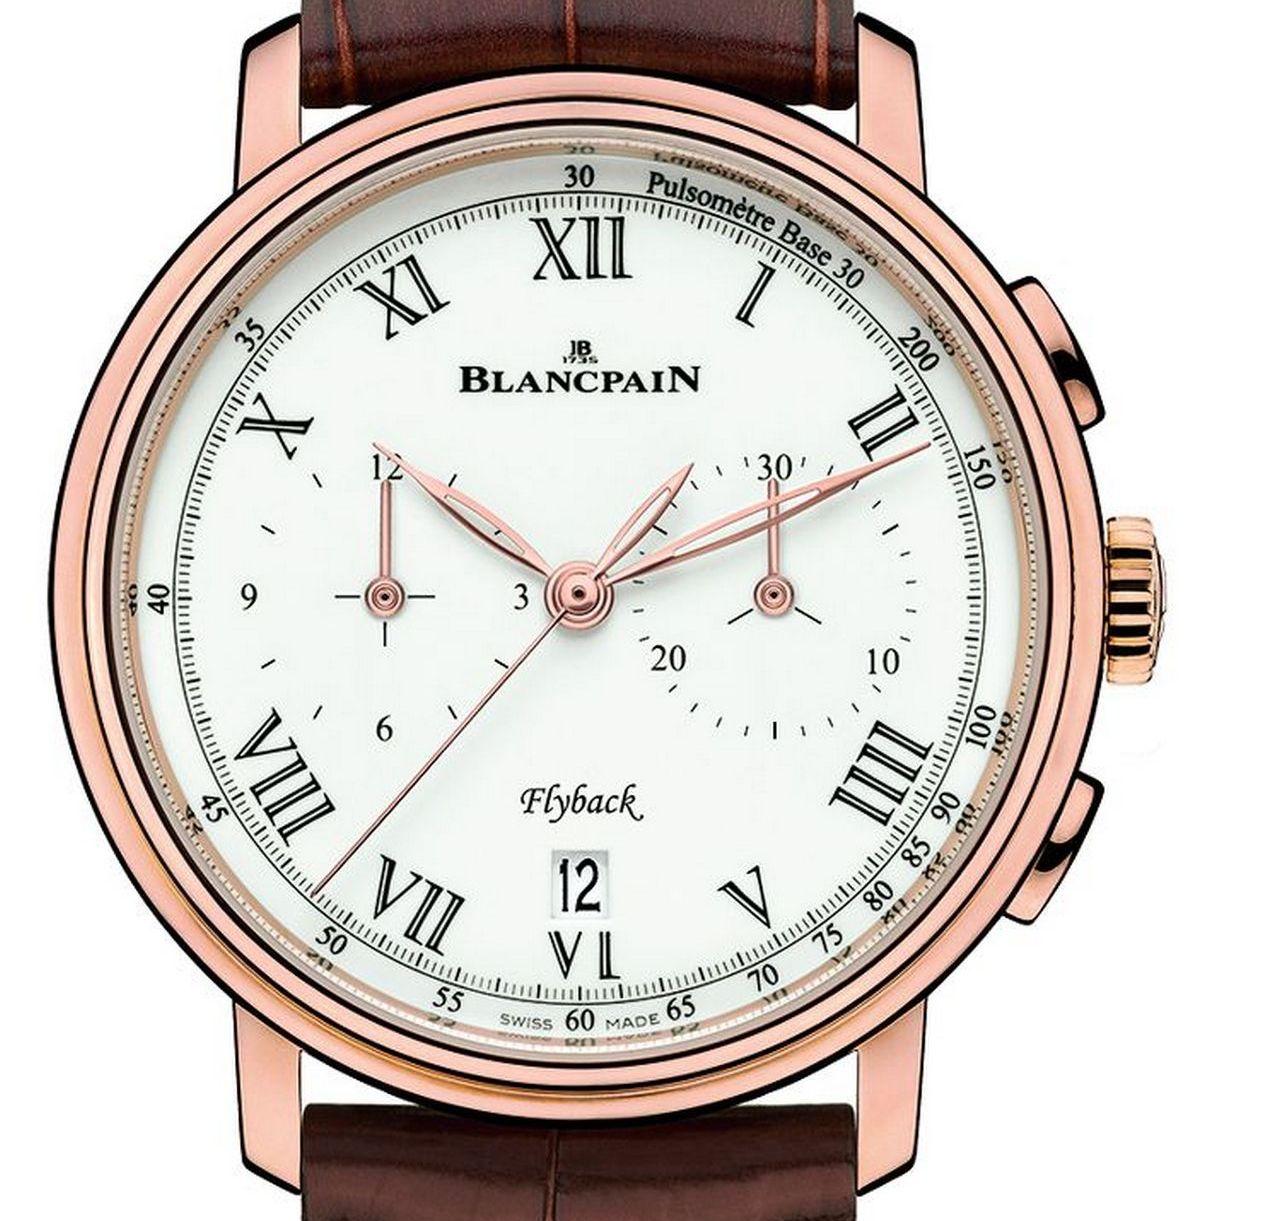 Blancpain Villeret Pulsometer Flyback Chronograph Ref 6680F-3631-55B prezzo price